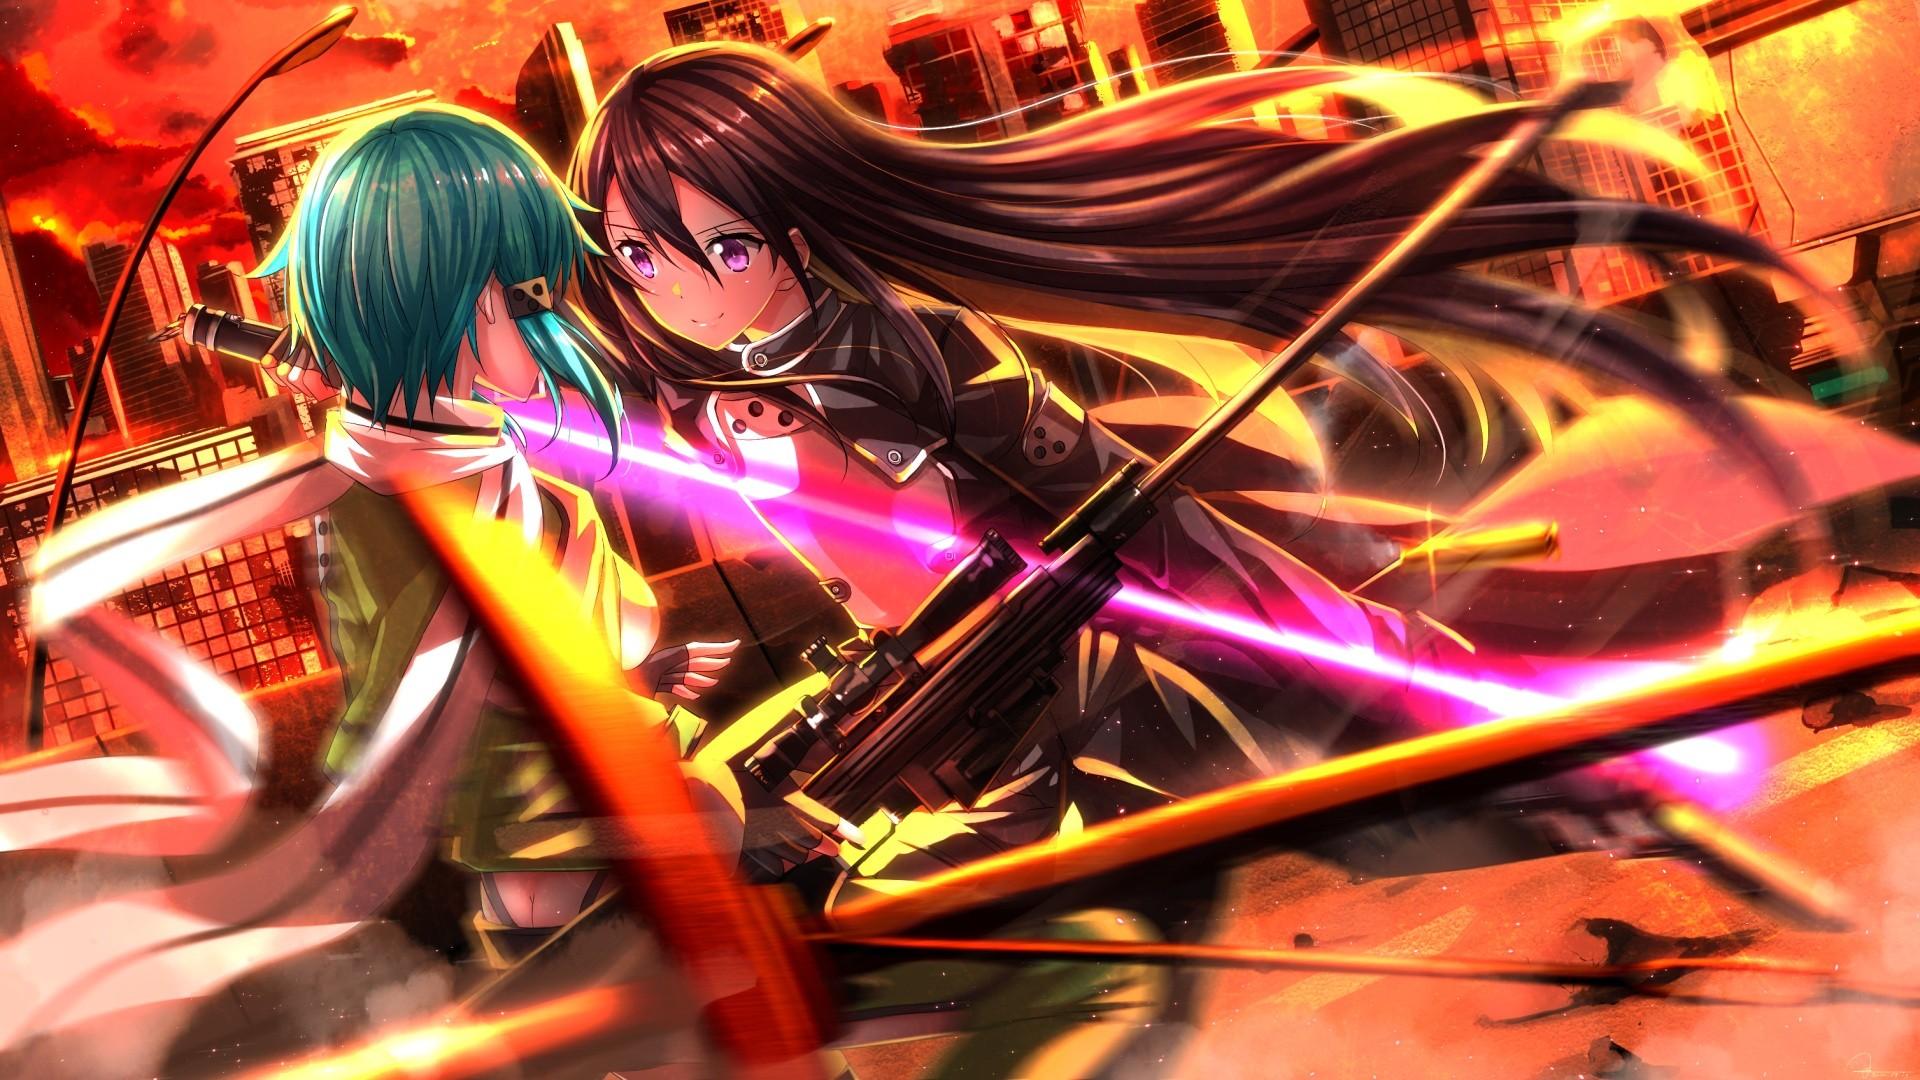 Anime 1920x1080 anime anime girls Swordsouls Sword Art Online Gun Gale Online  Kirigaya Kazuto Asada Shino long hair weapon anime games PC gaming Pixiv sniper rifle aqua hair sword girls with swords brunette